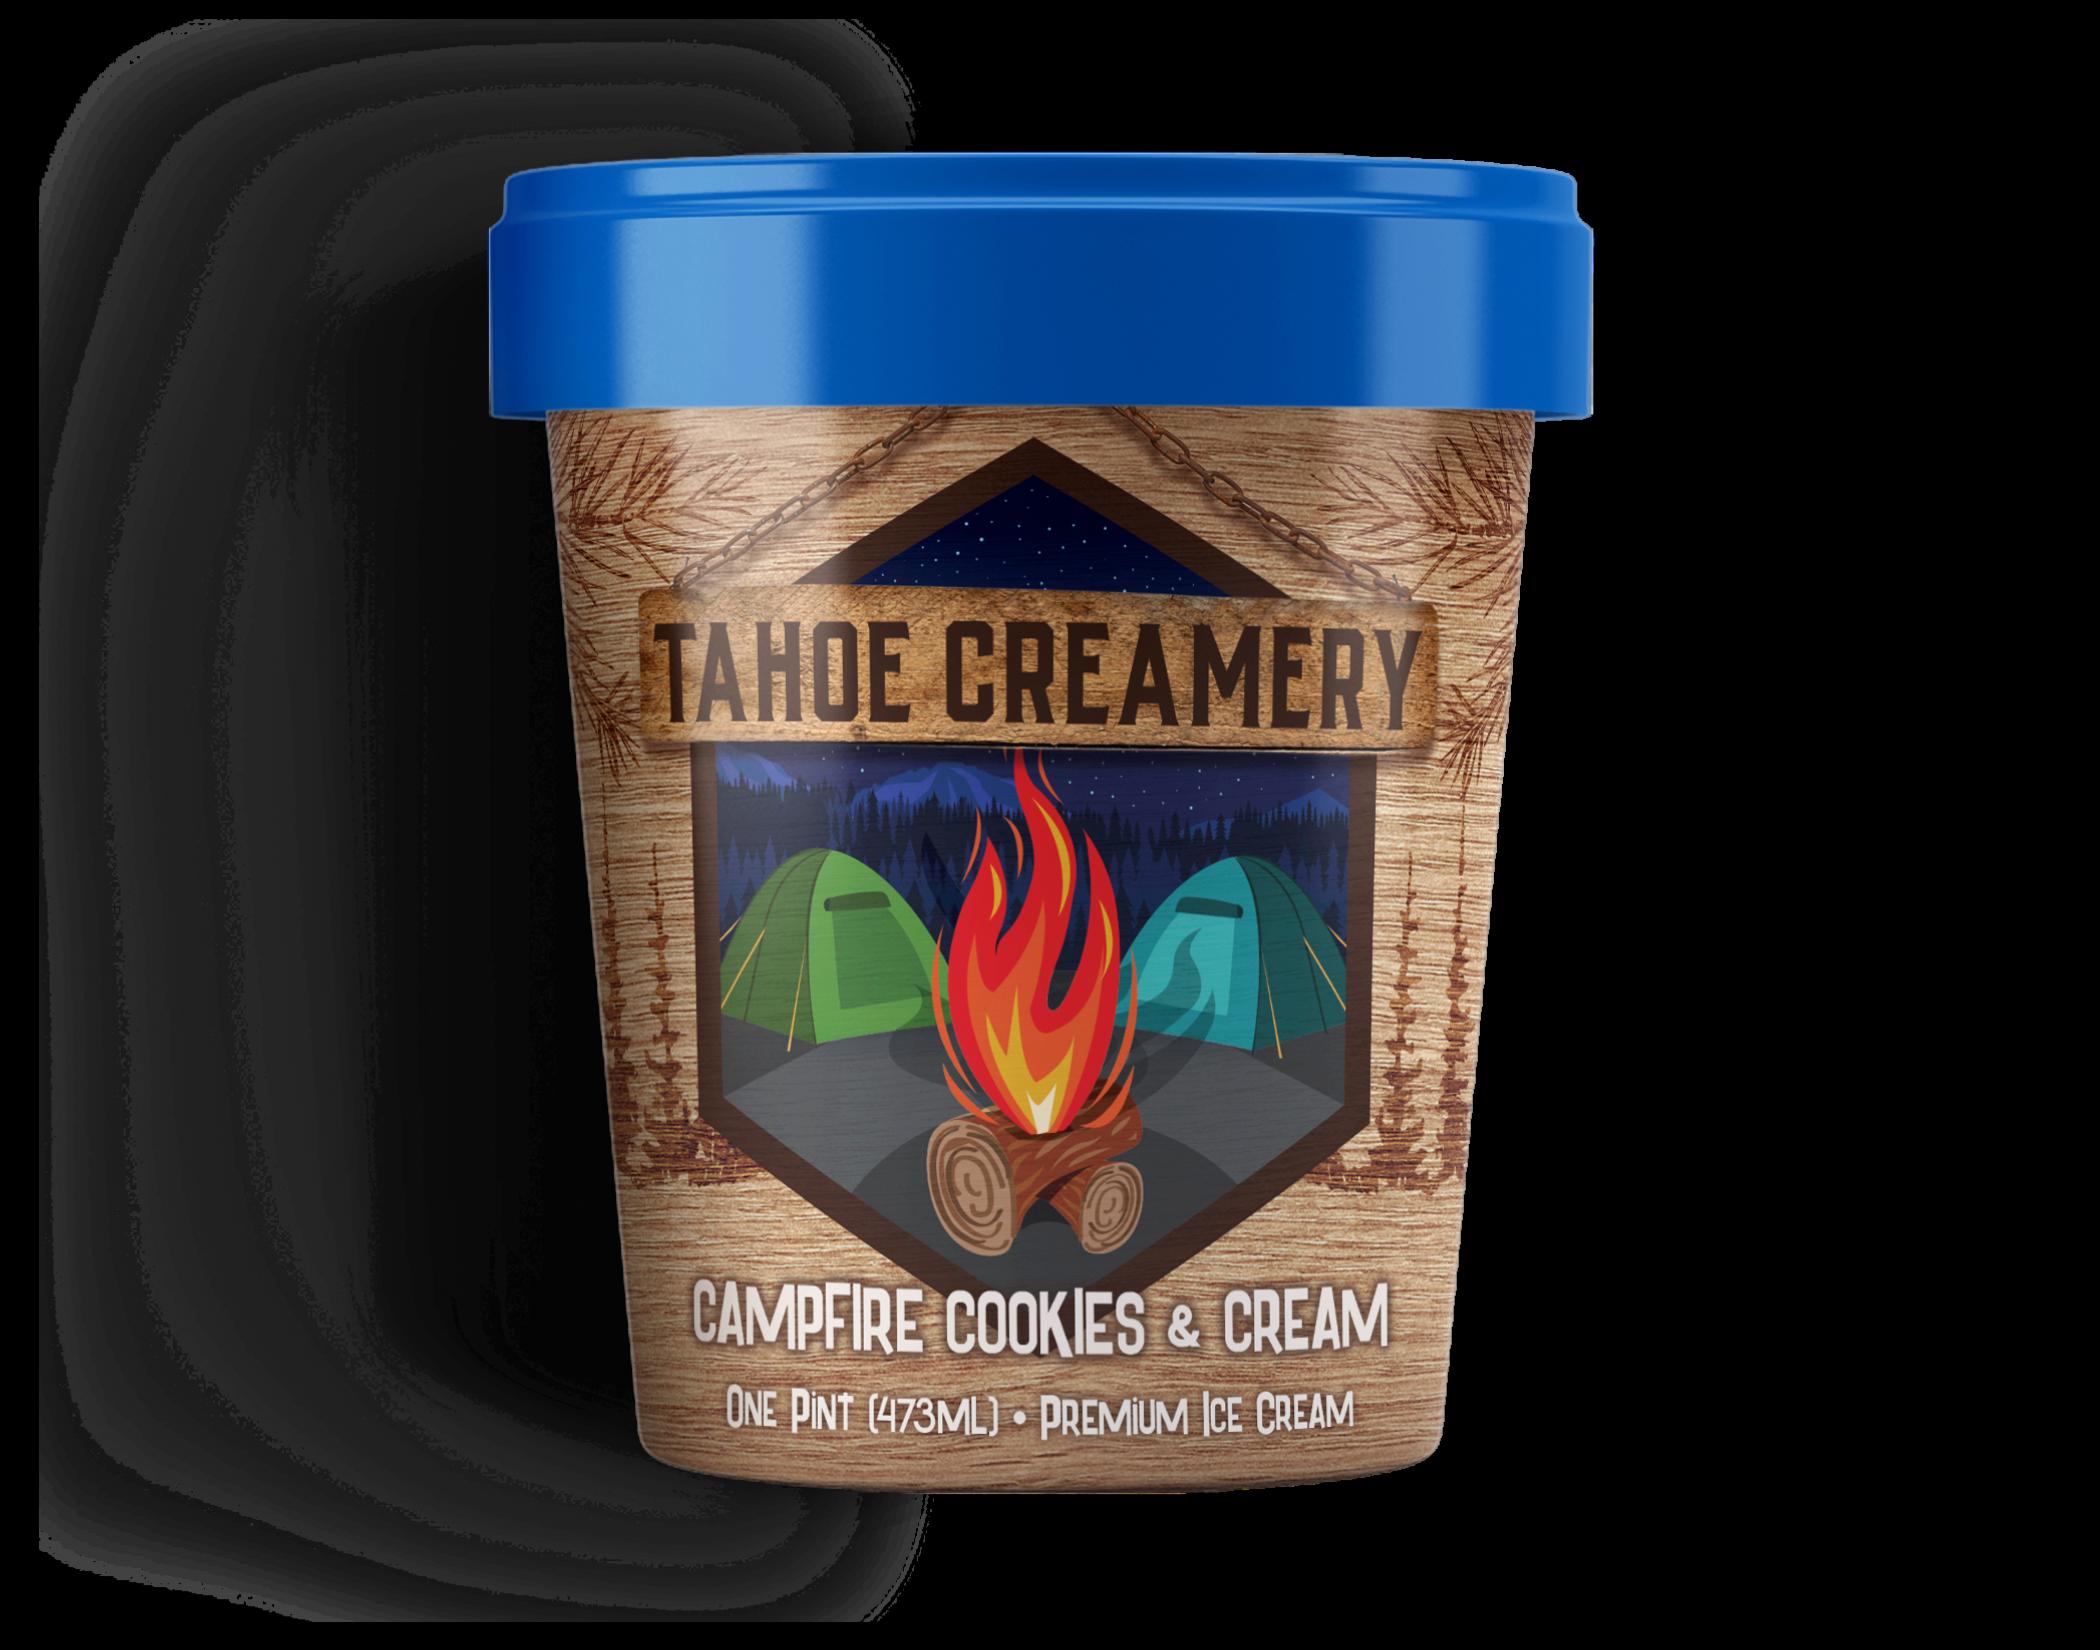 Campfire Cookies & Cream